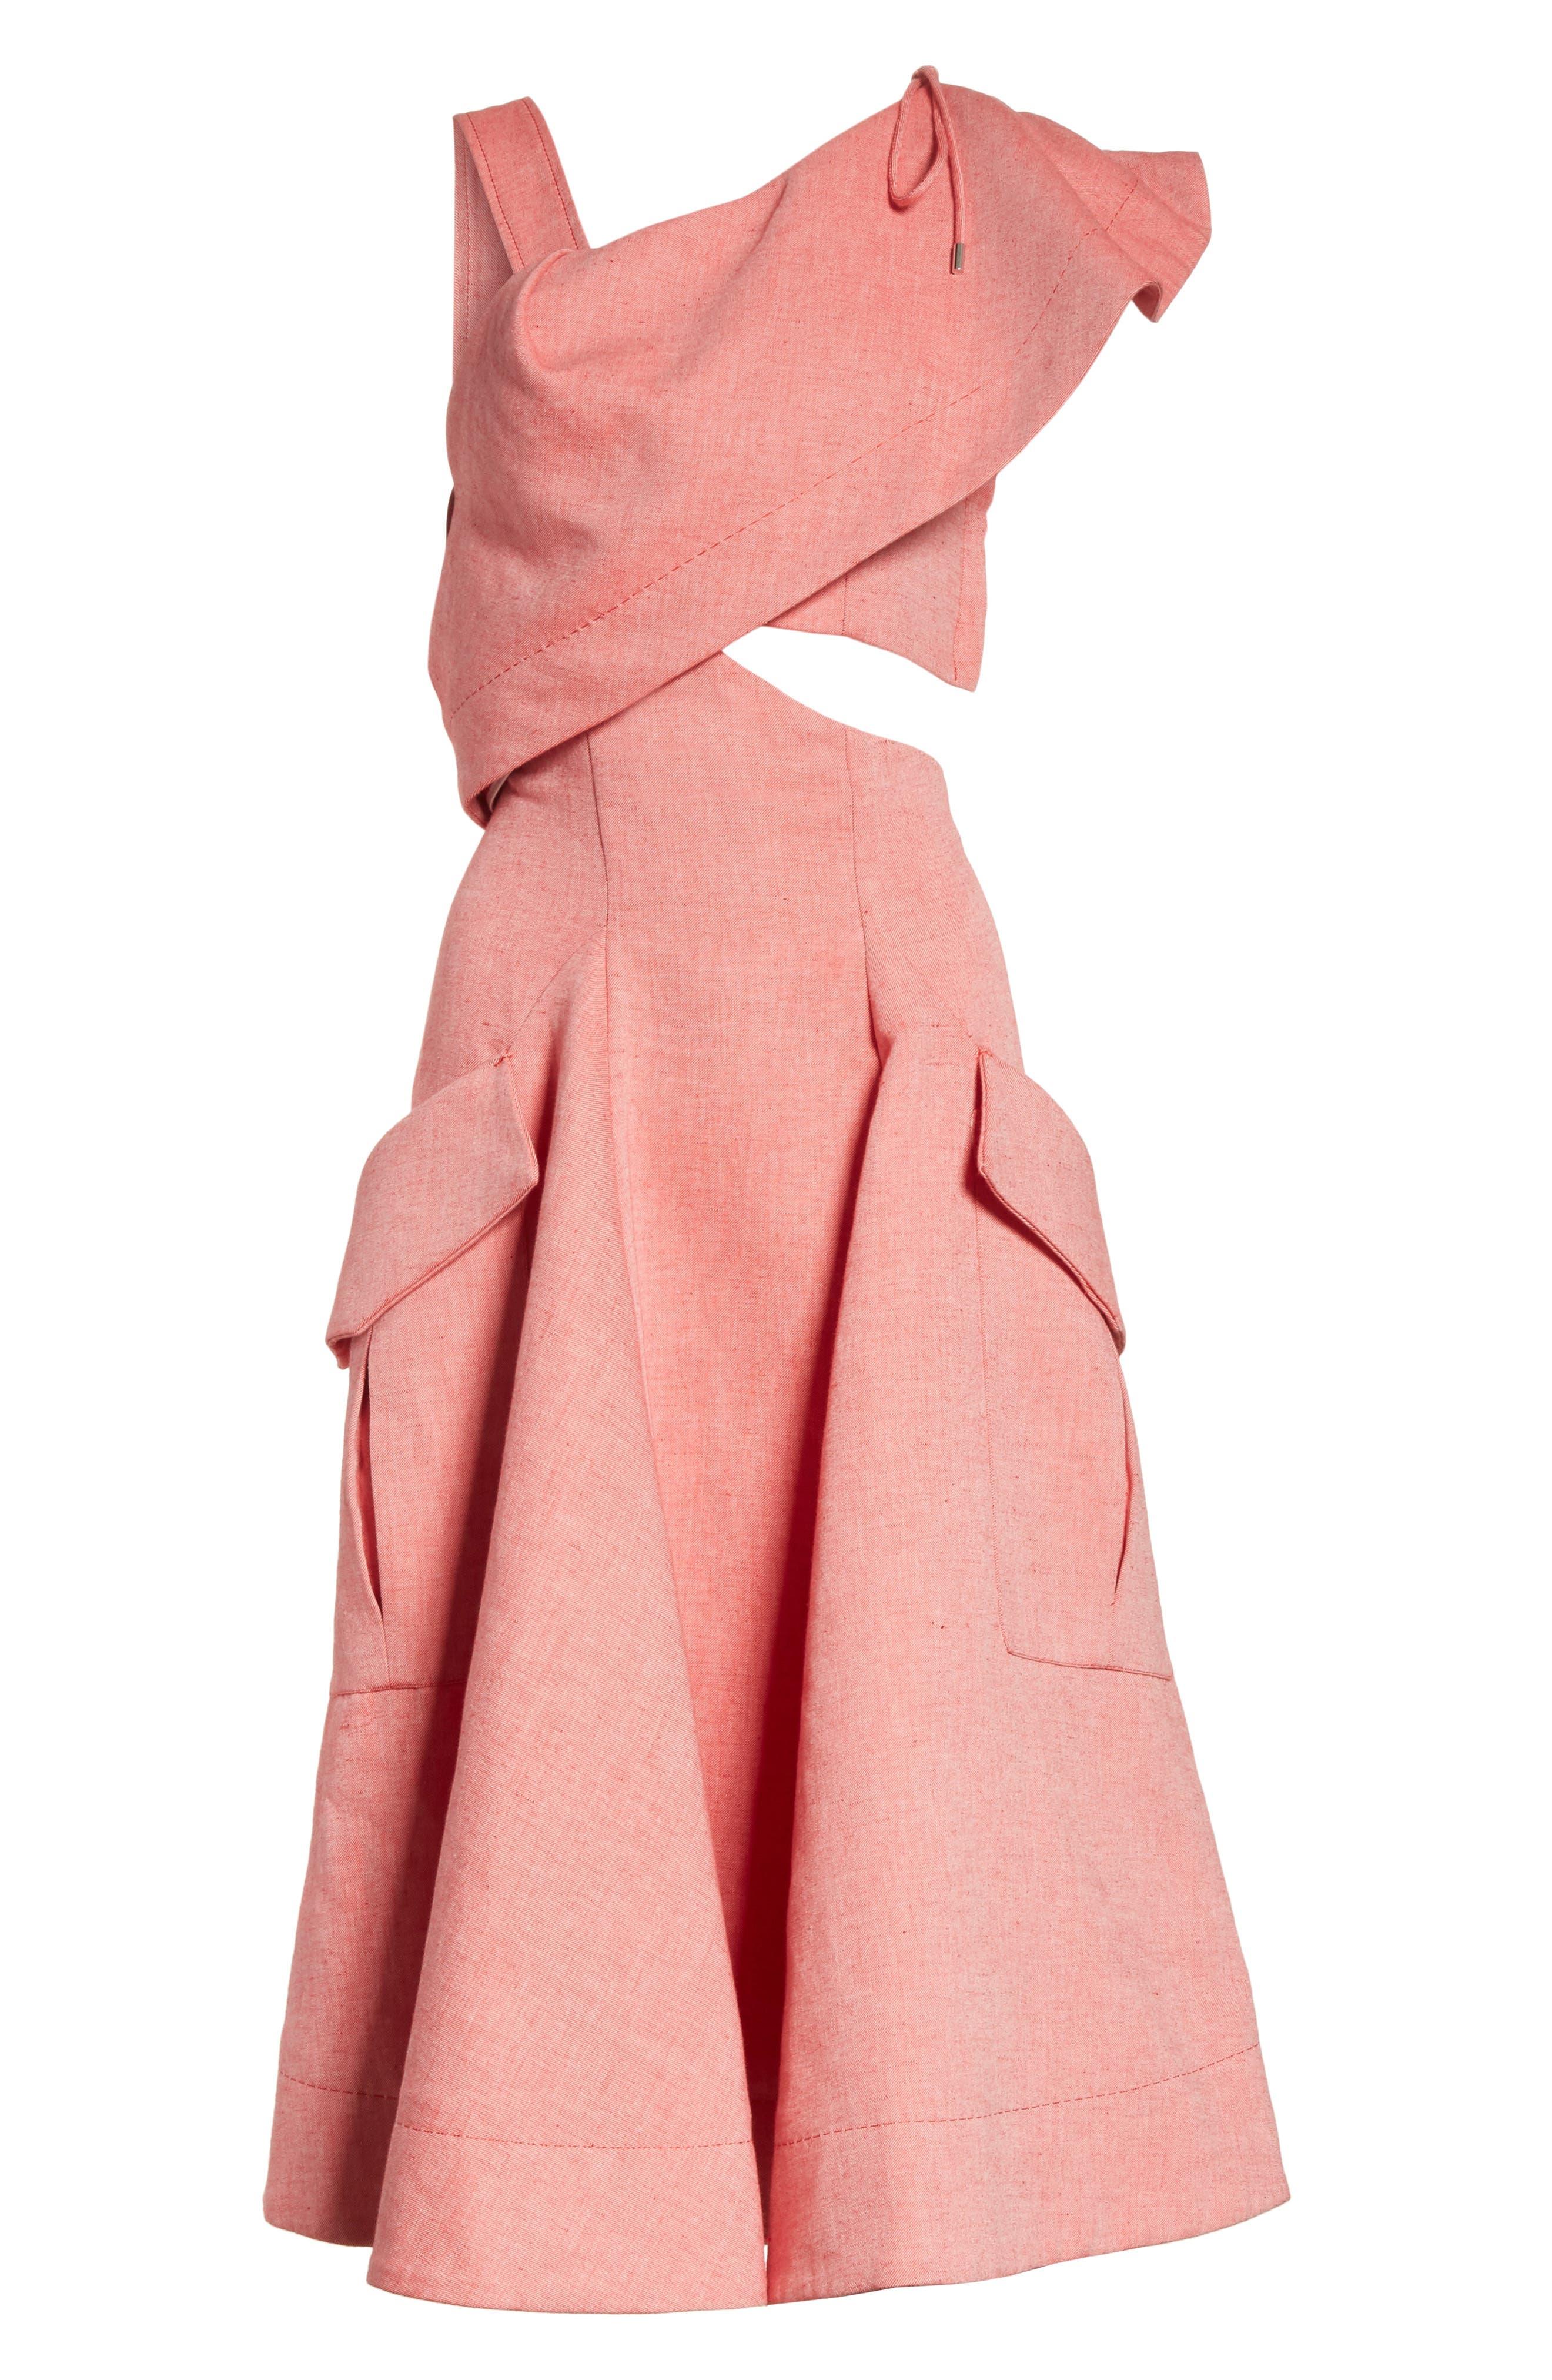 Robe Genou Dress,                             Alternate thumbnail 6, color,                             650